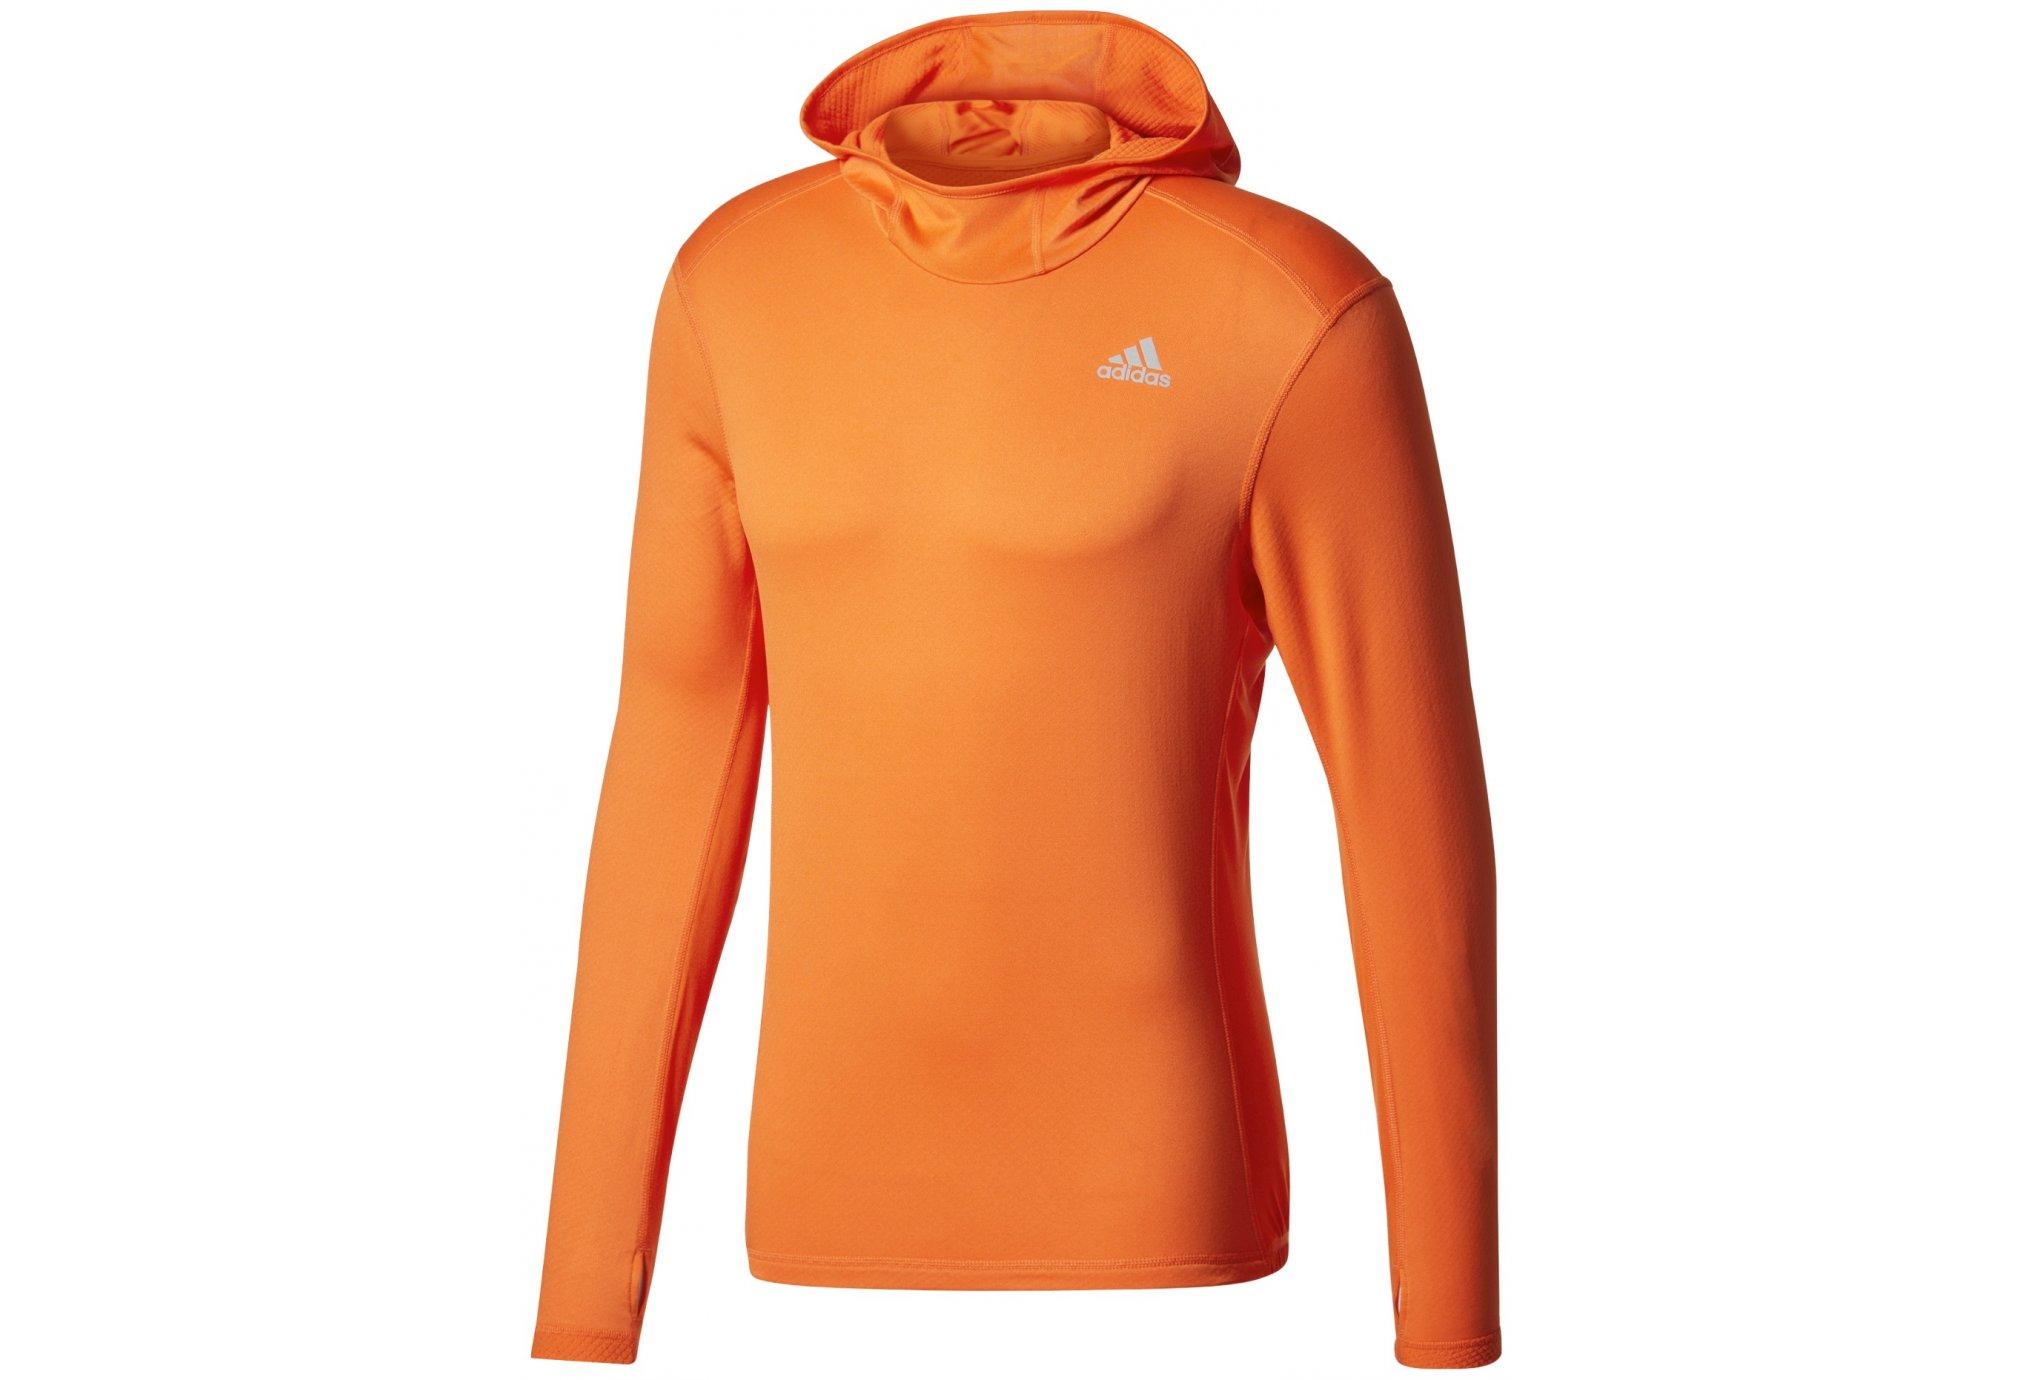 Adidas Response climawarm hoodie m vêtement running homme